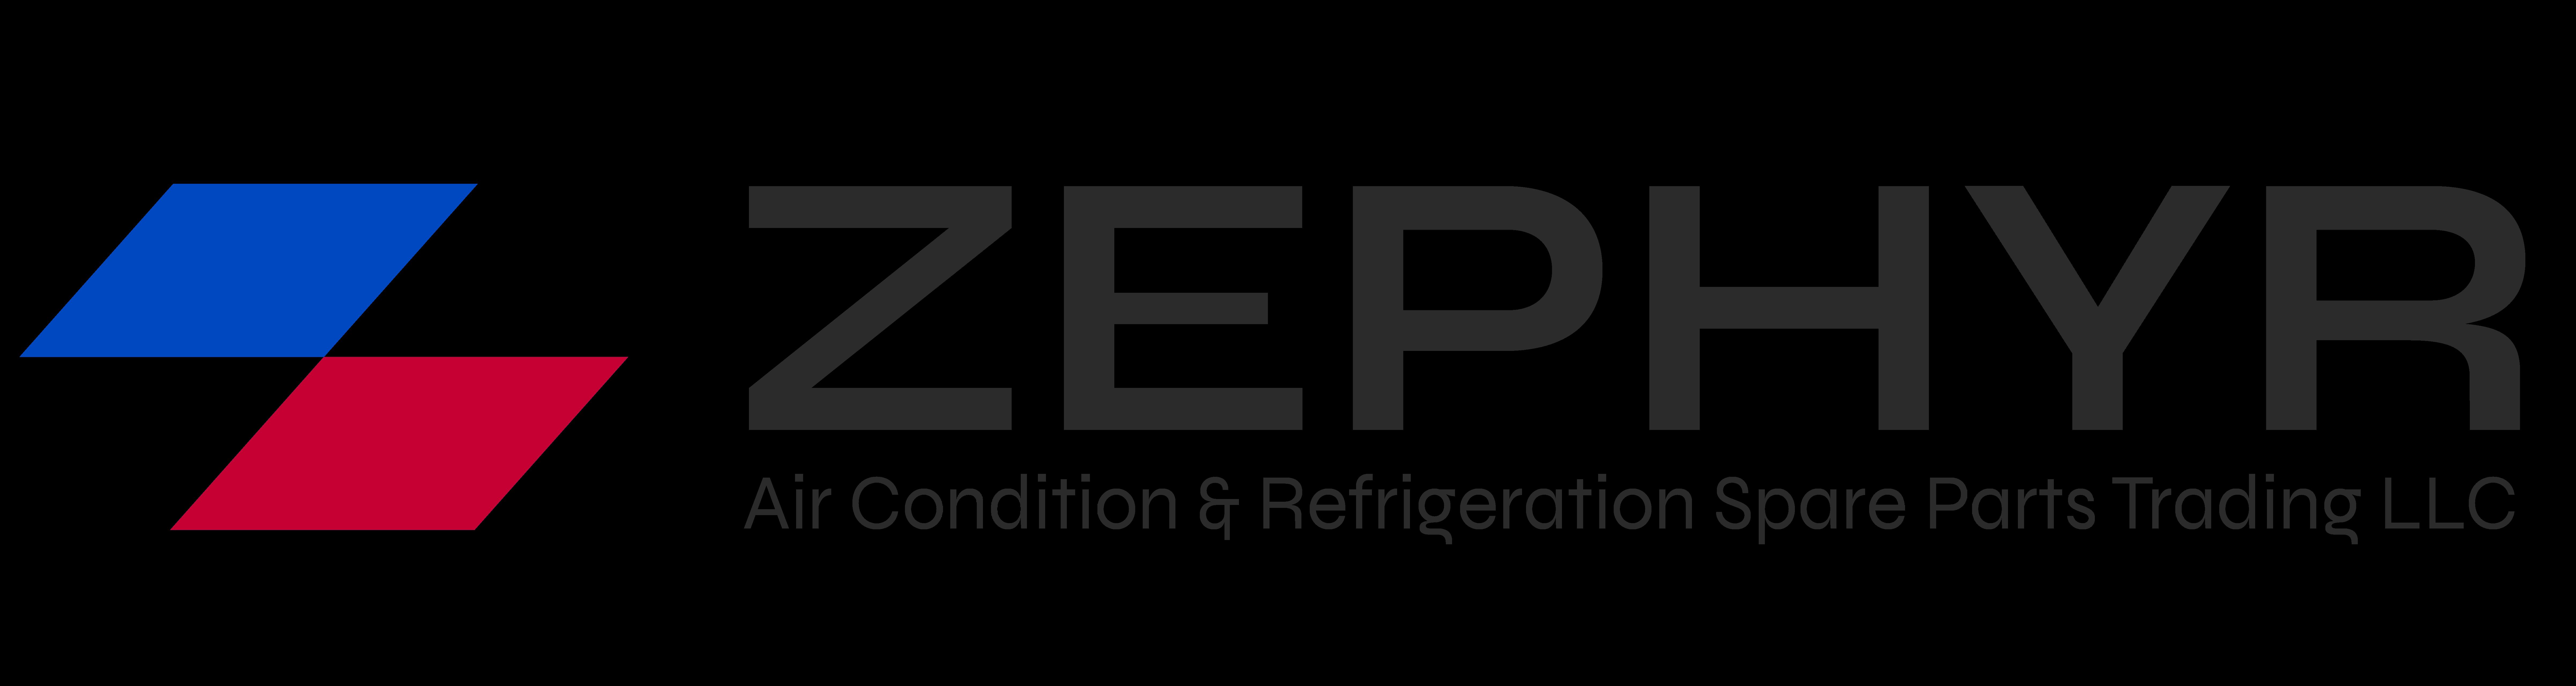 Zephyr AC Spare Parts Trading LLC